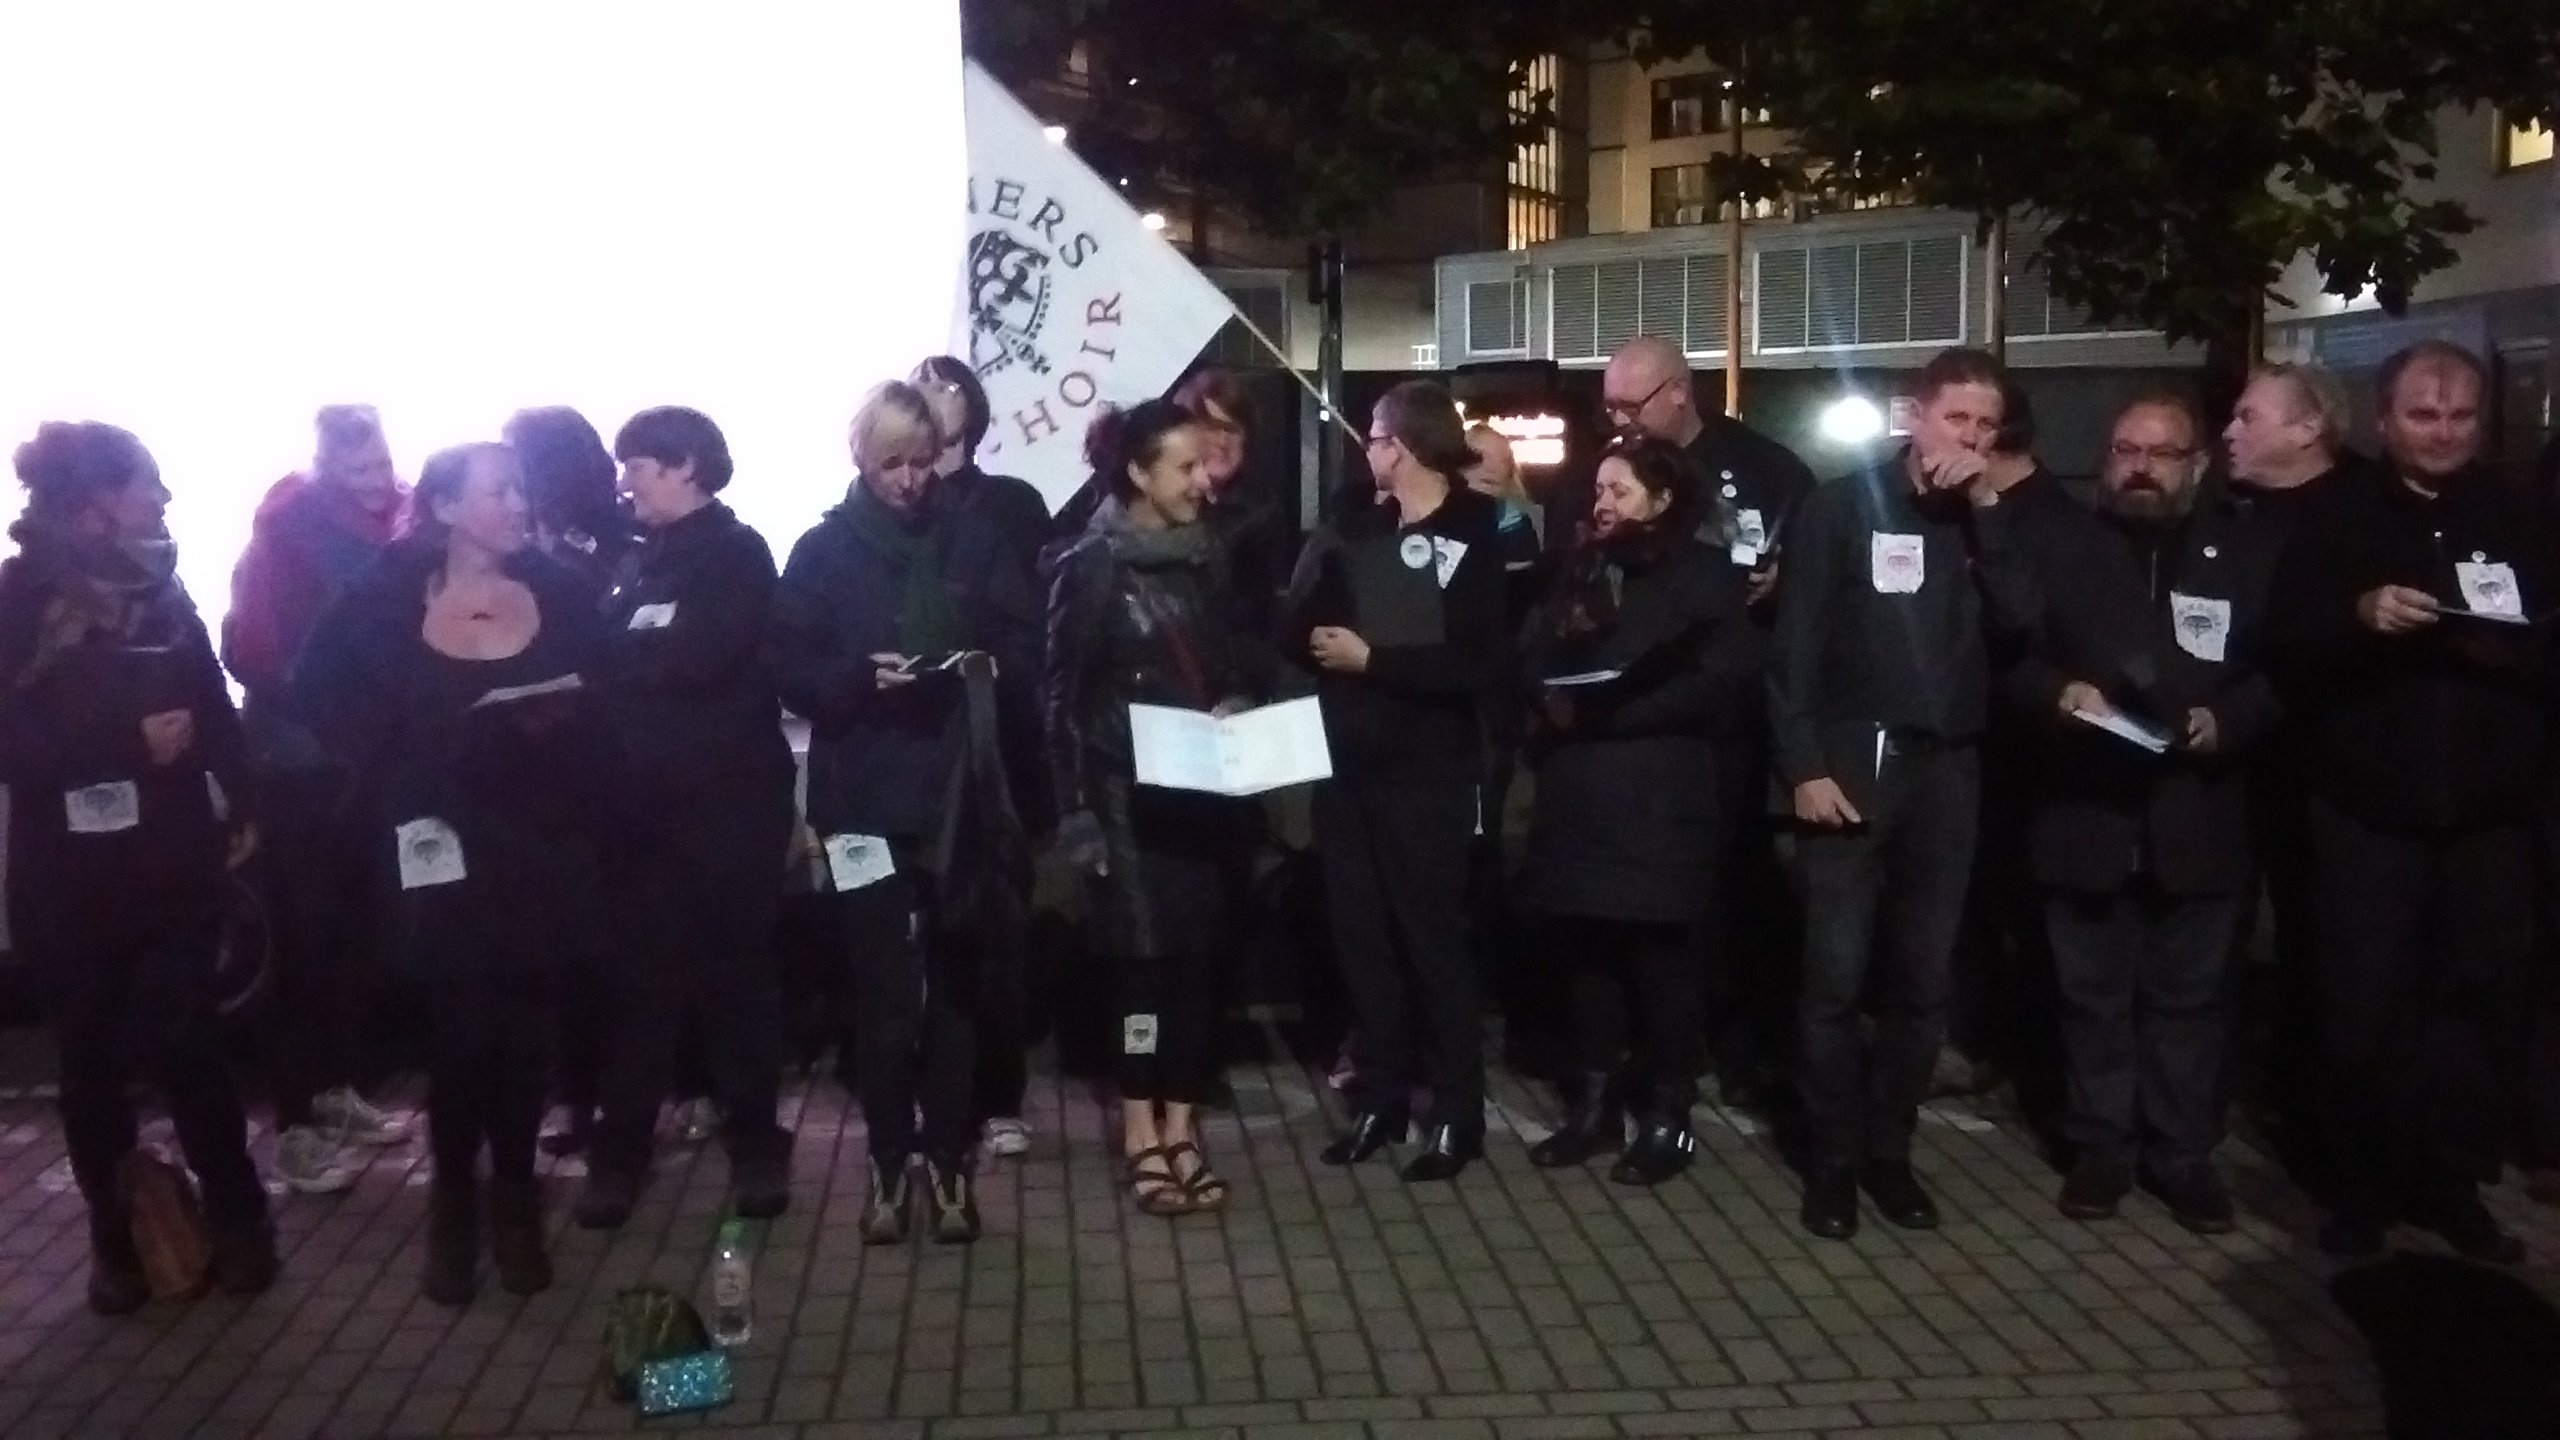 The Commoners Choir